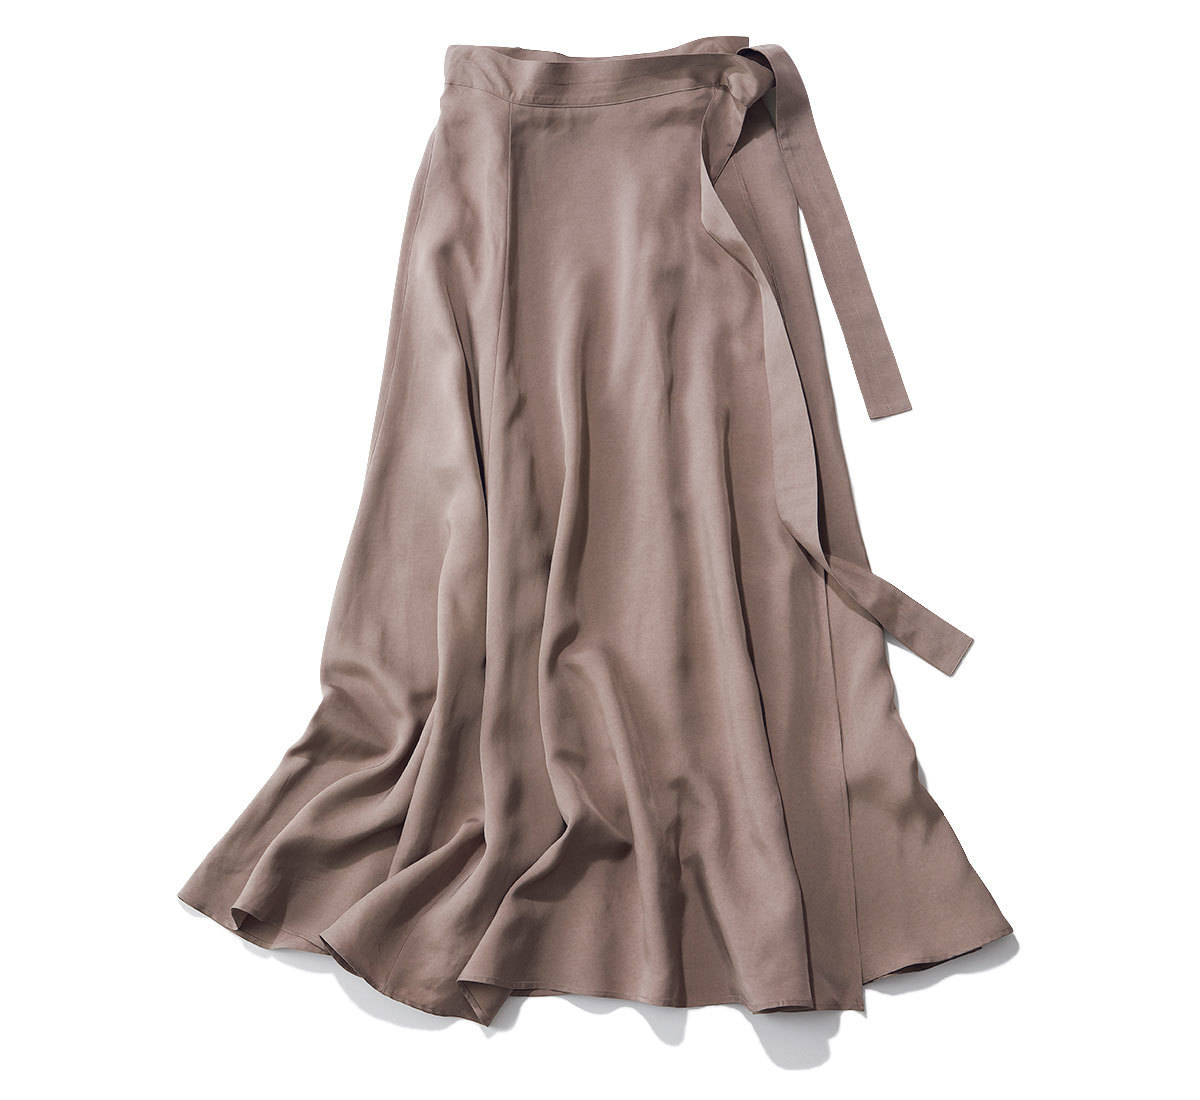 Chaos 光沢ラップスカート